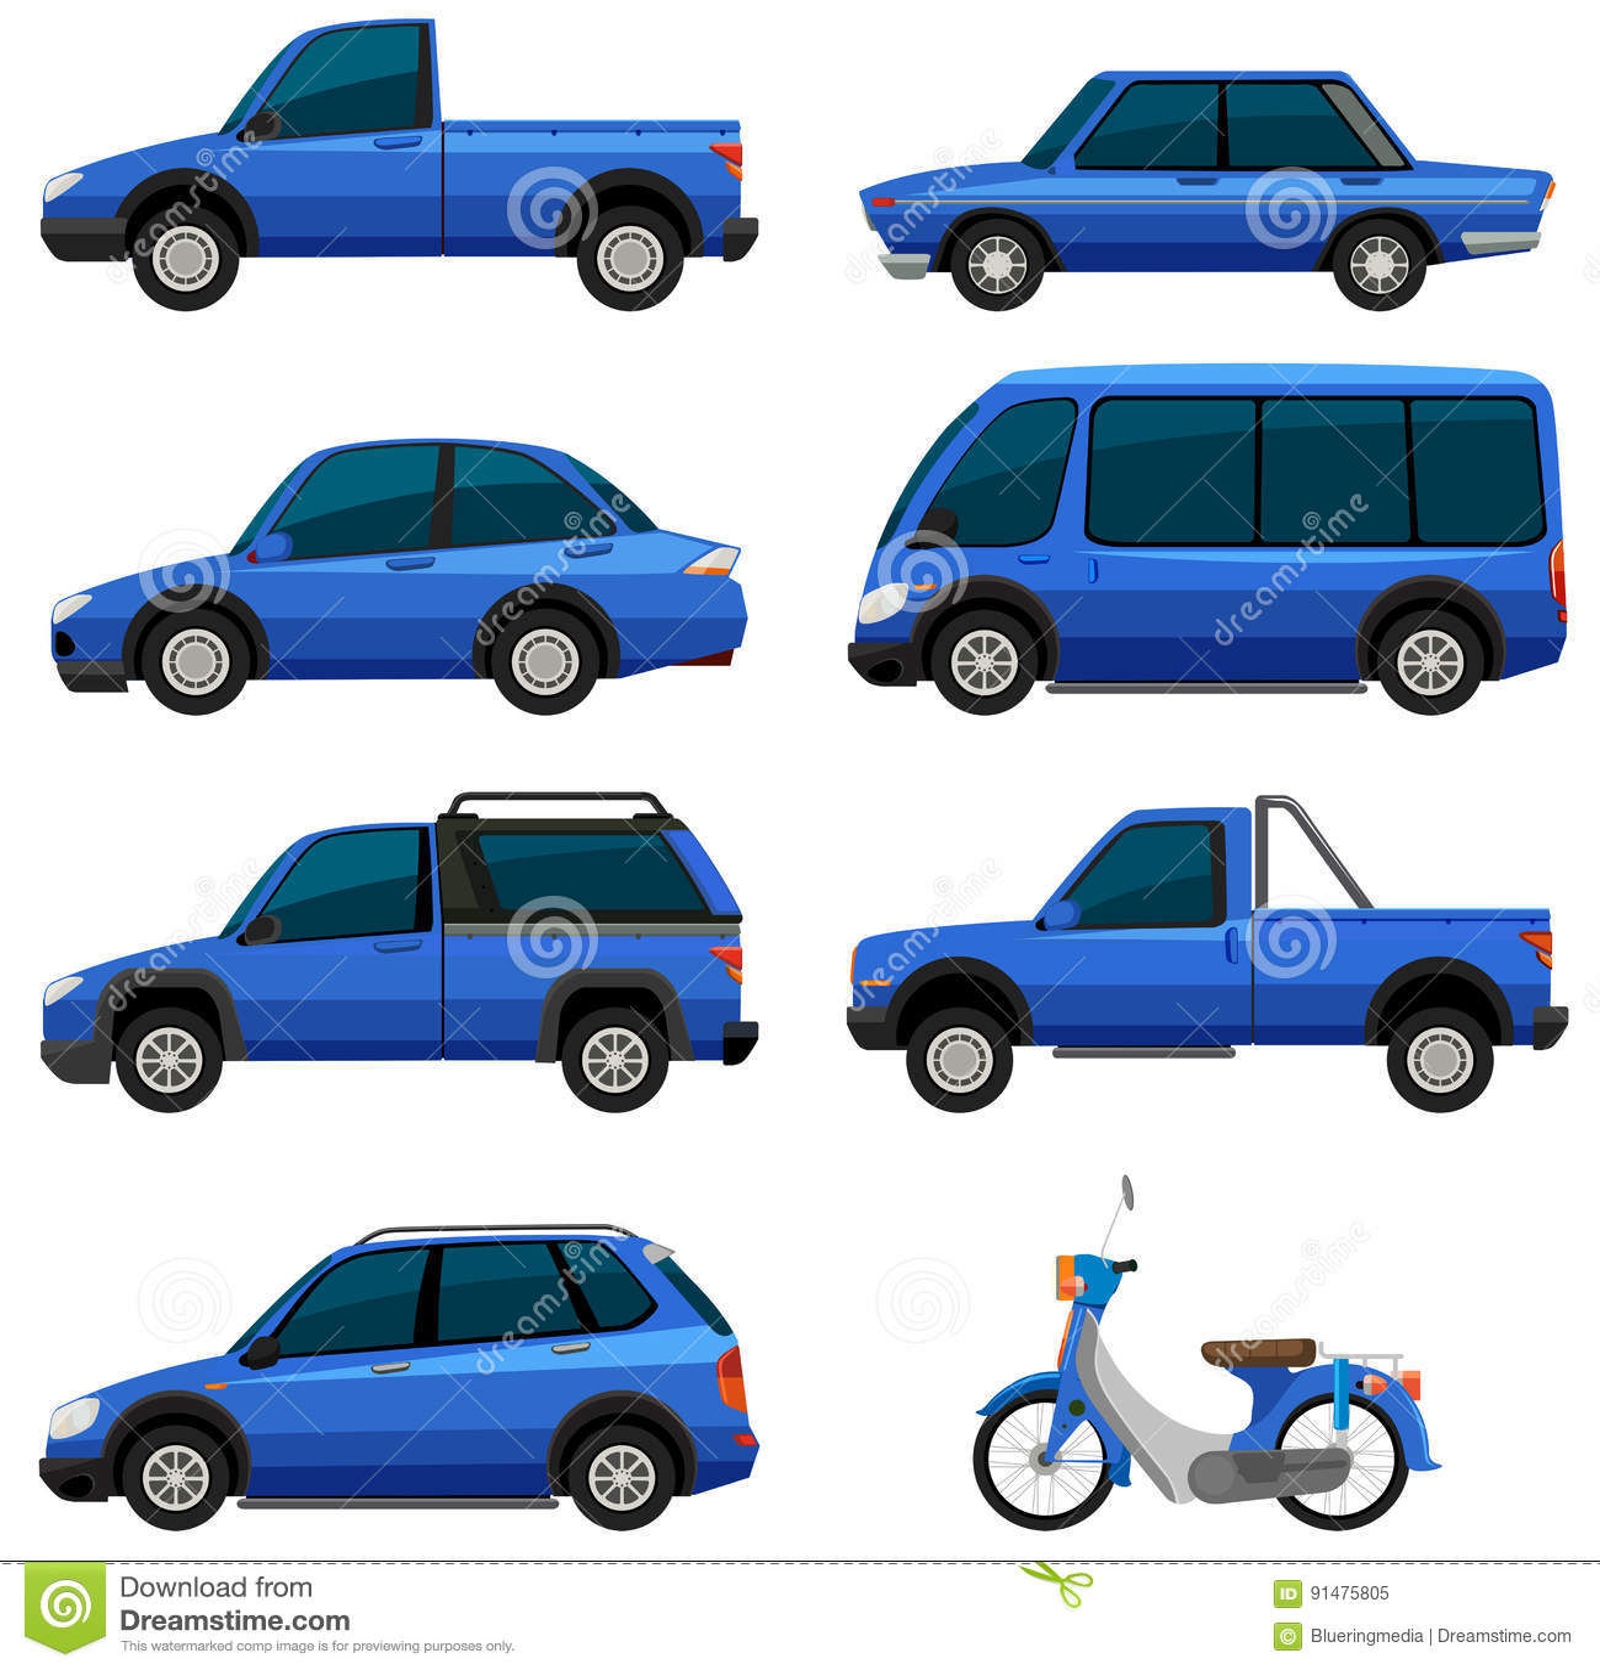 different types of transportations in blue color stock. Black Bedroom Furniture Sets. Home Design Ideas